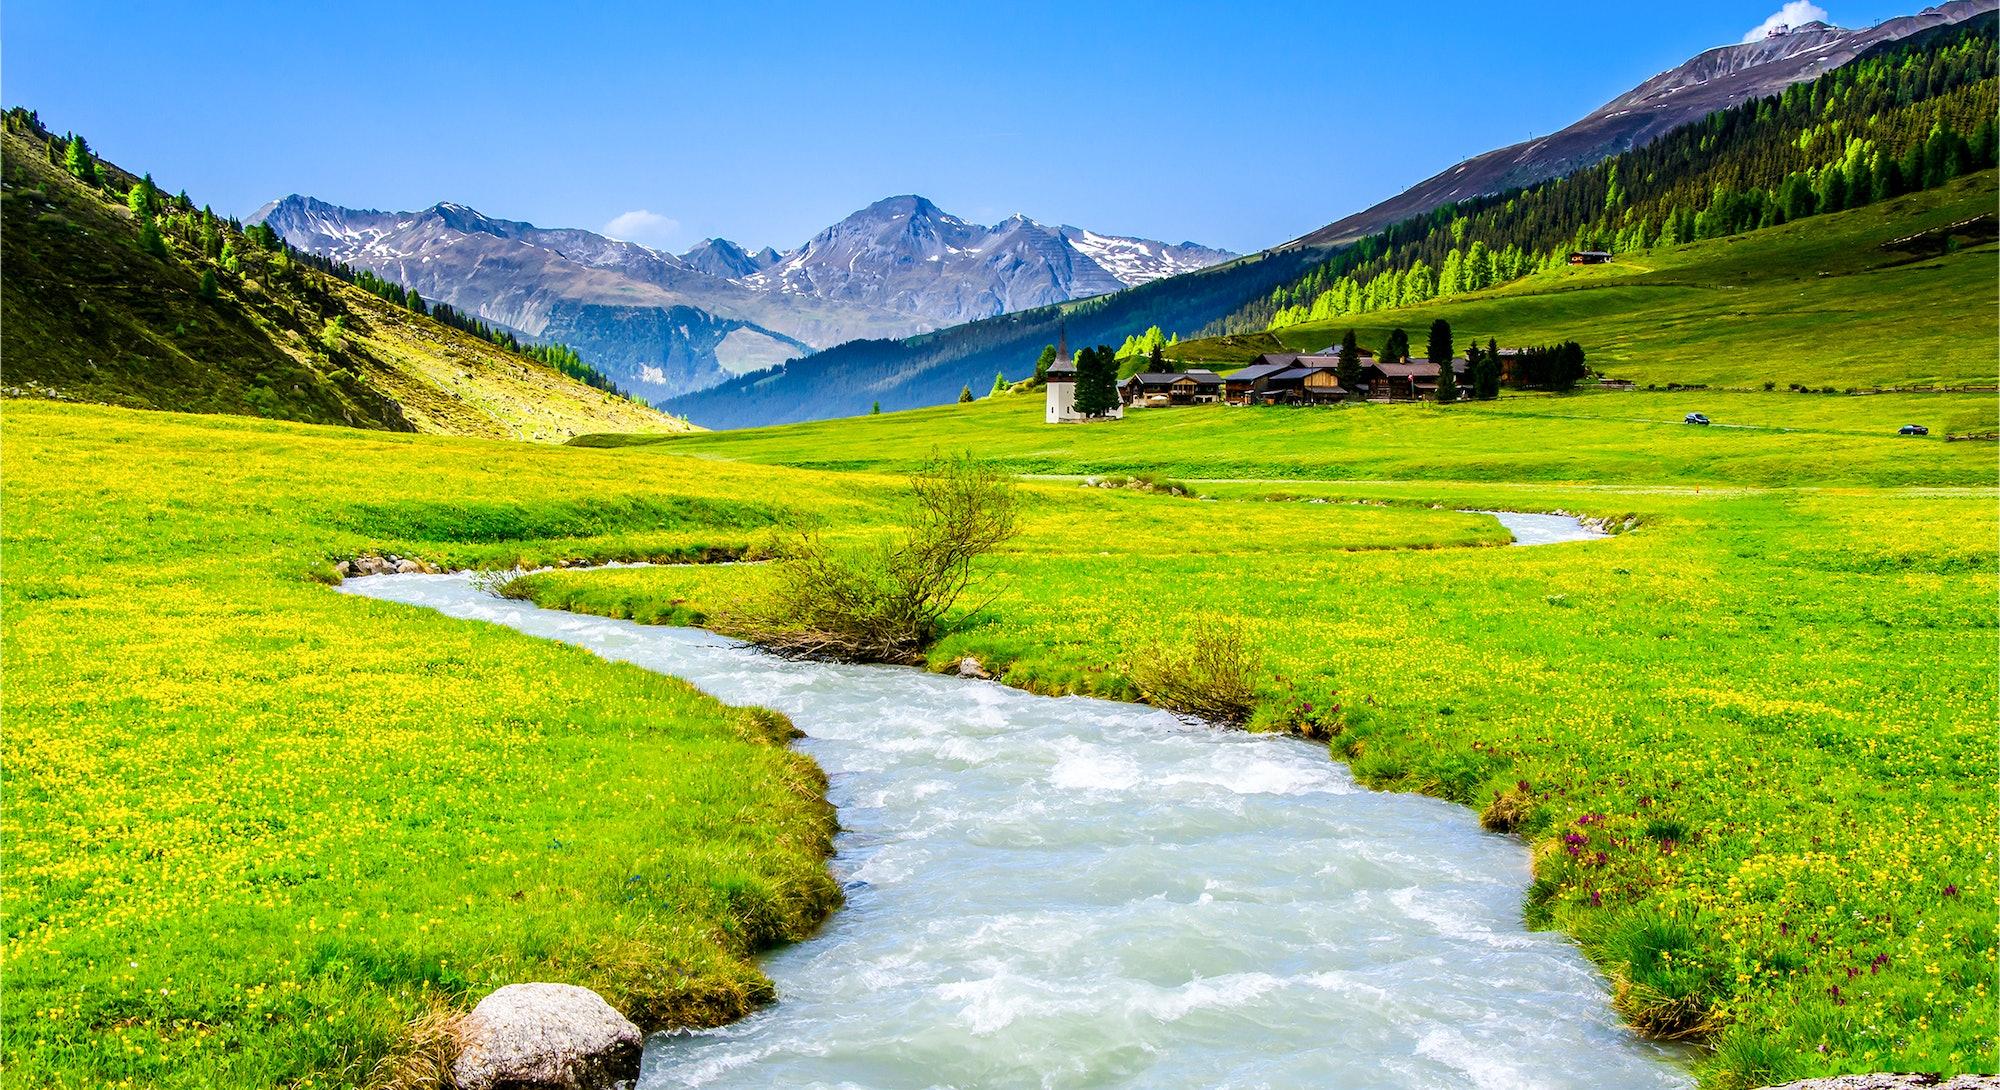 Mountain green valley river creek landscape. River creek in mountain valley. Mountain valley creek. Mountain valley landscape